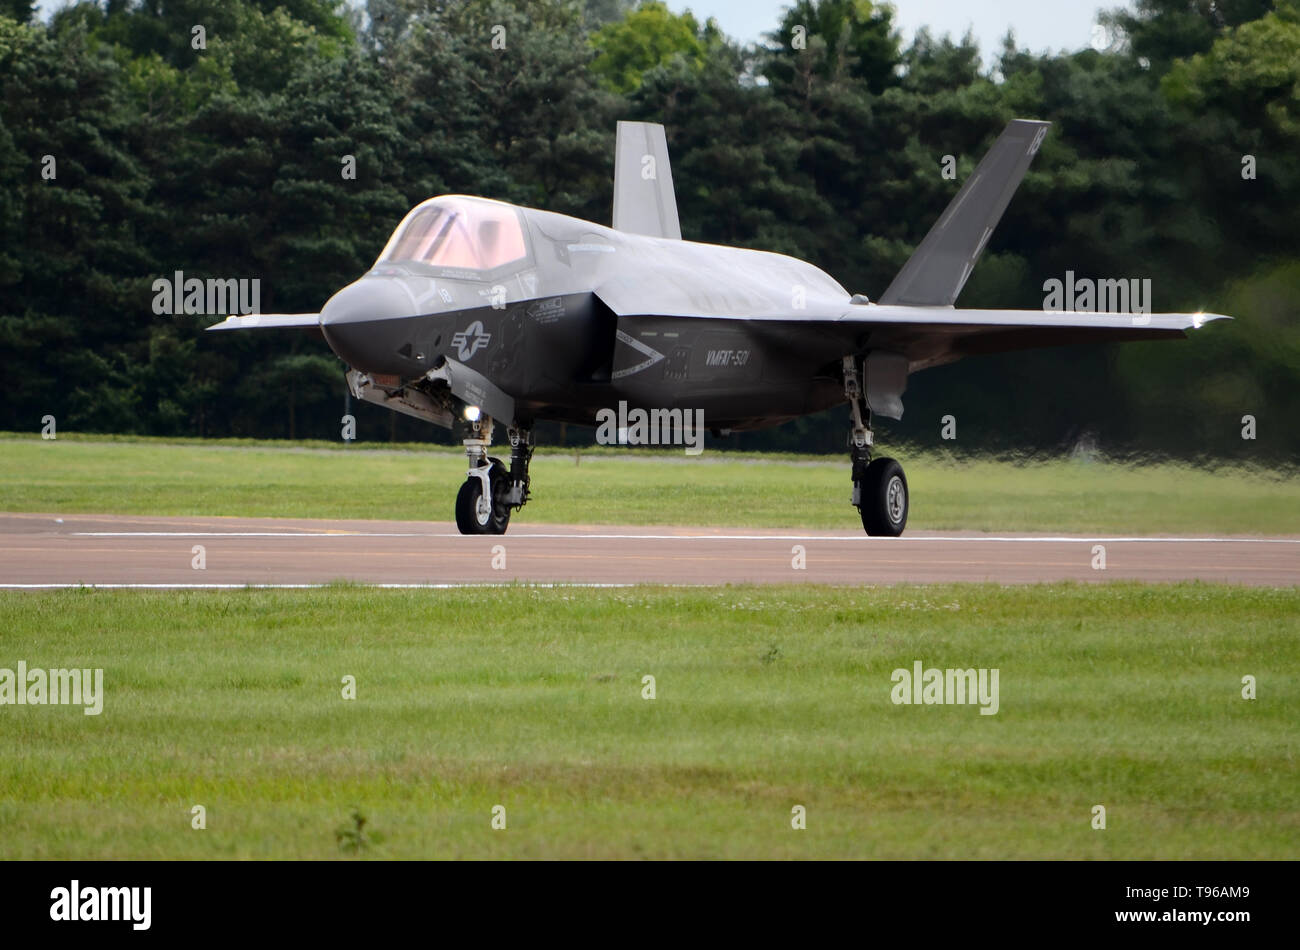 Lockheed Martin F-35 Lightning II - Stock Image